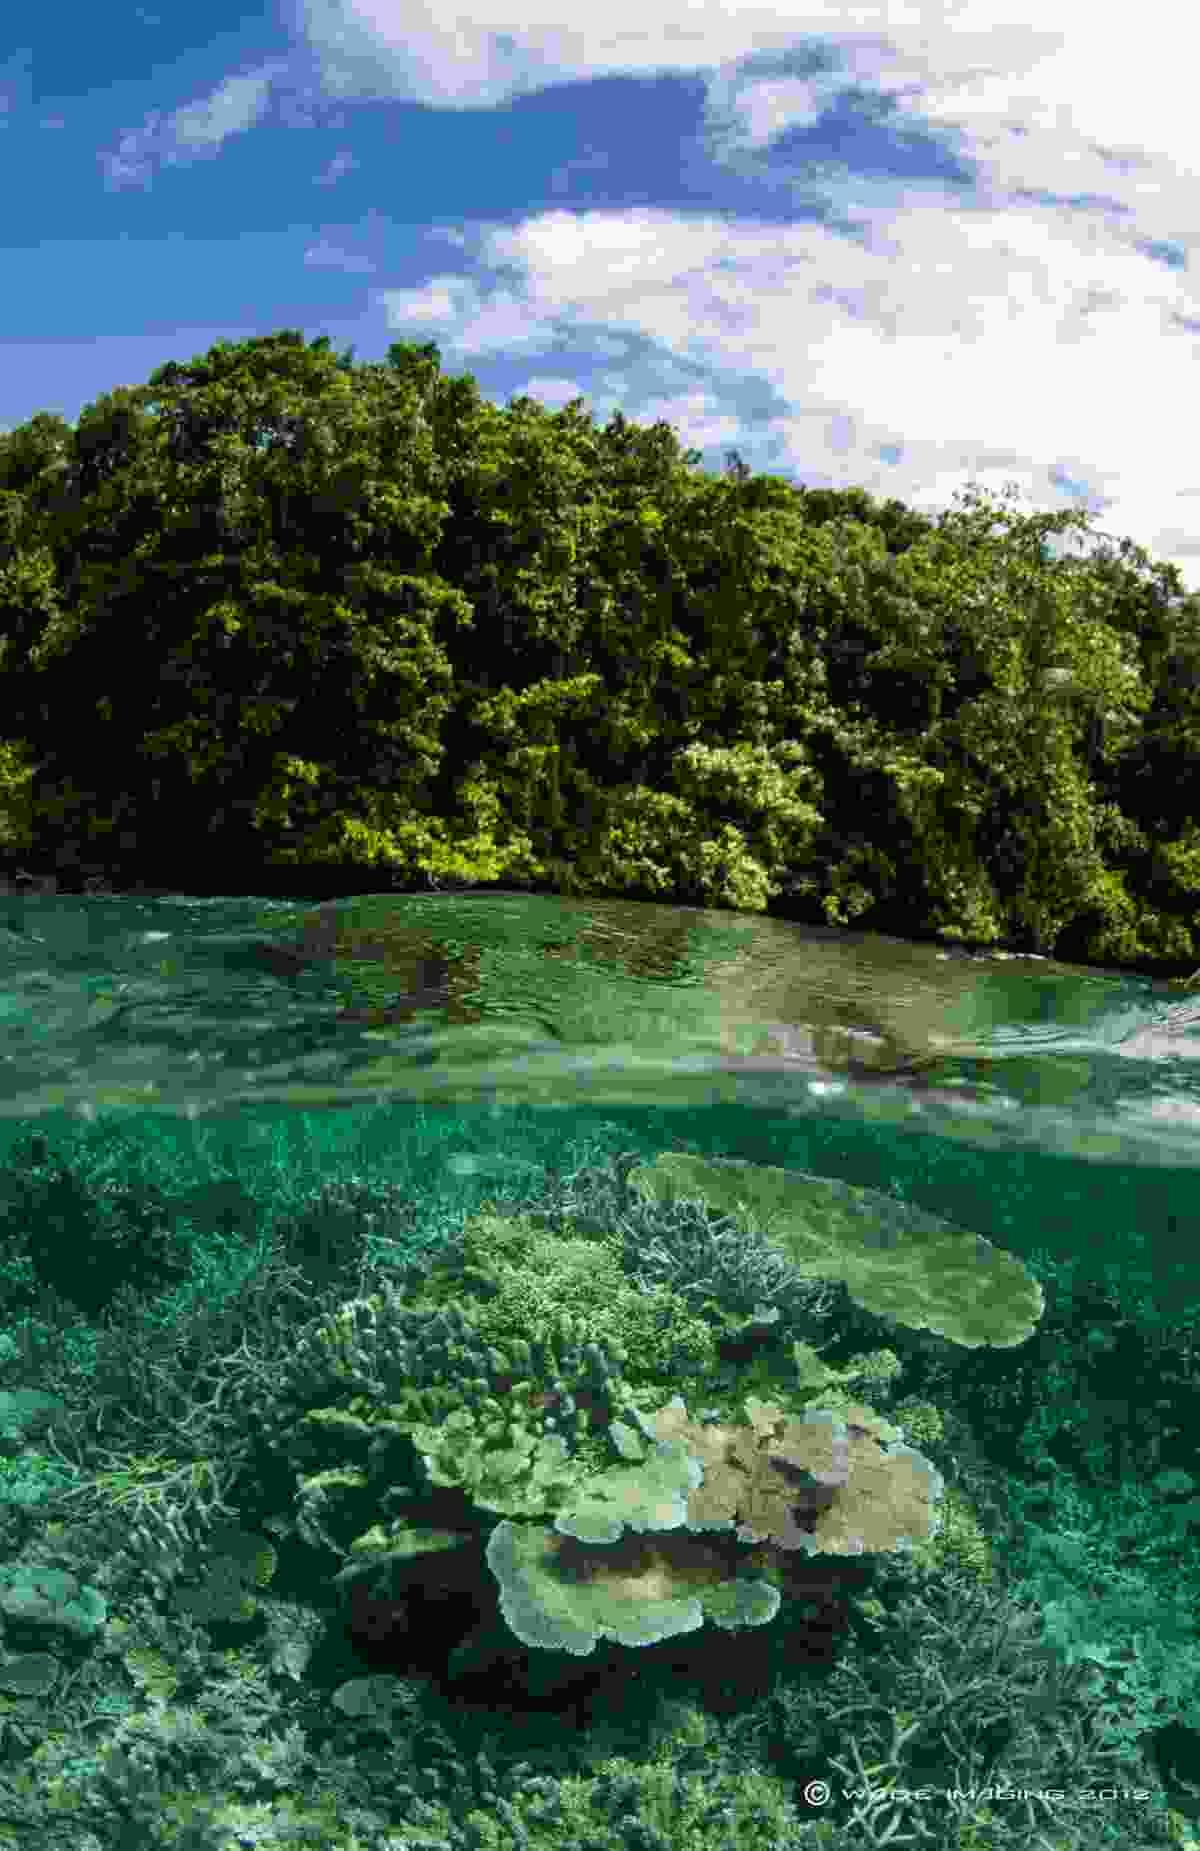 Milne Bay (Wade Imaging)